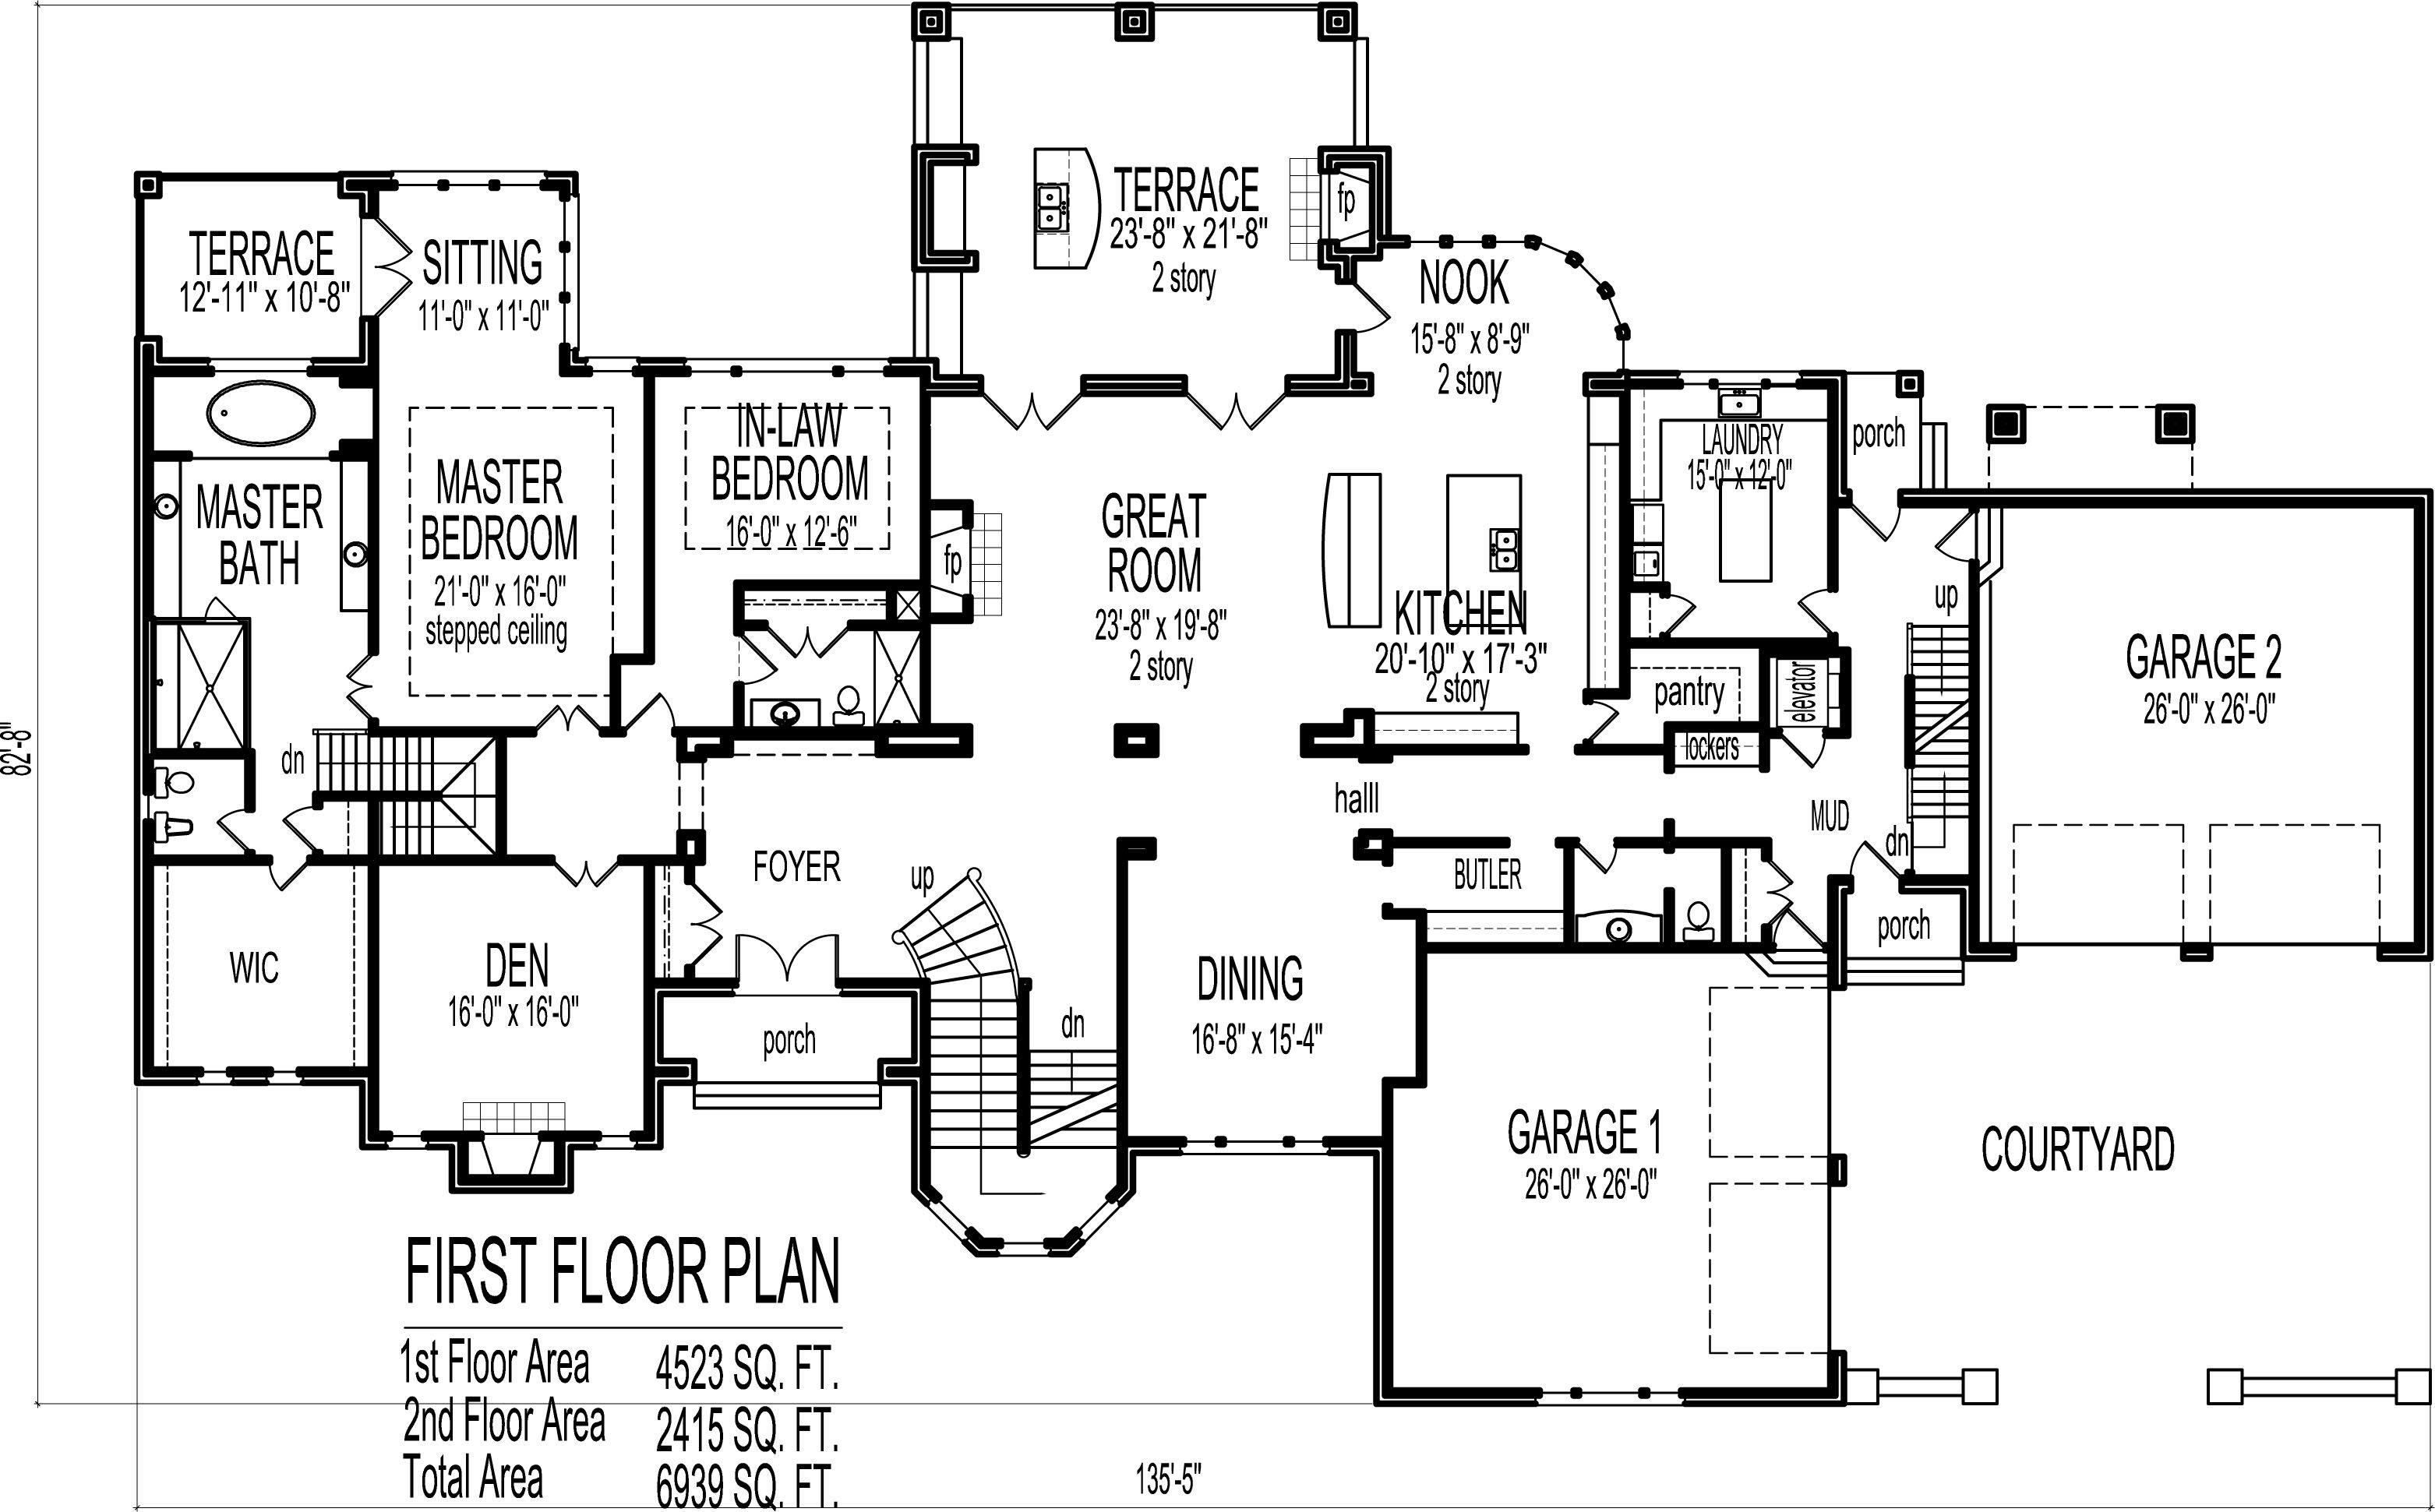 6 Bedroom 7 Bathroom Dream Home Plans Indianapolis Ft Wayne